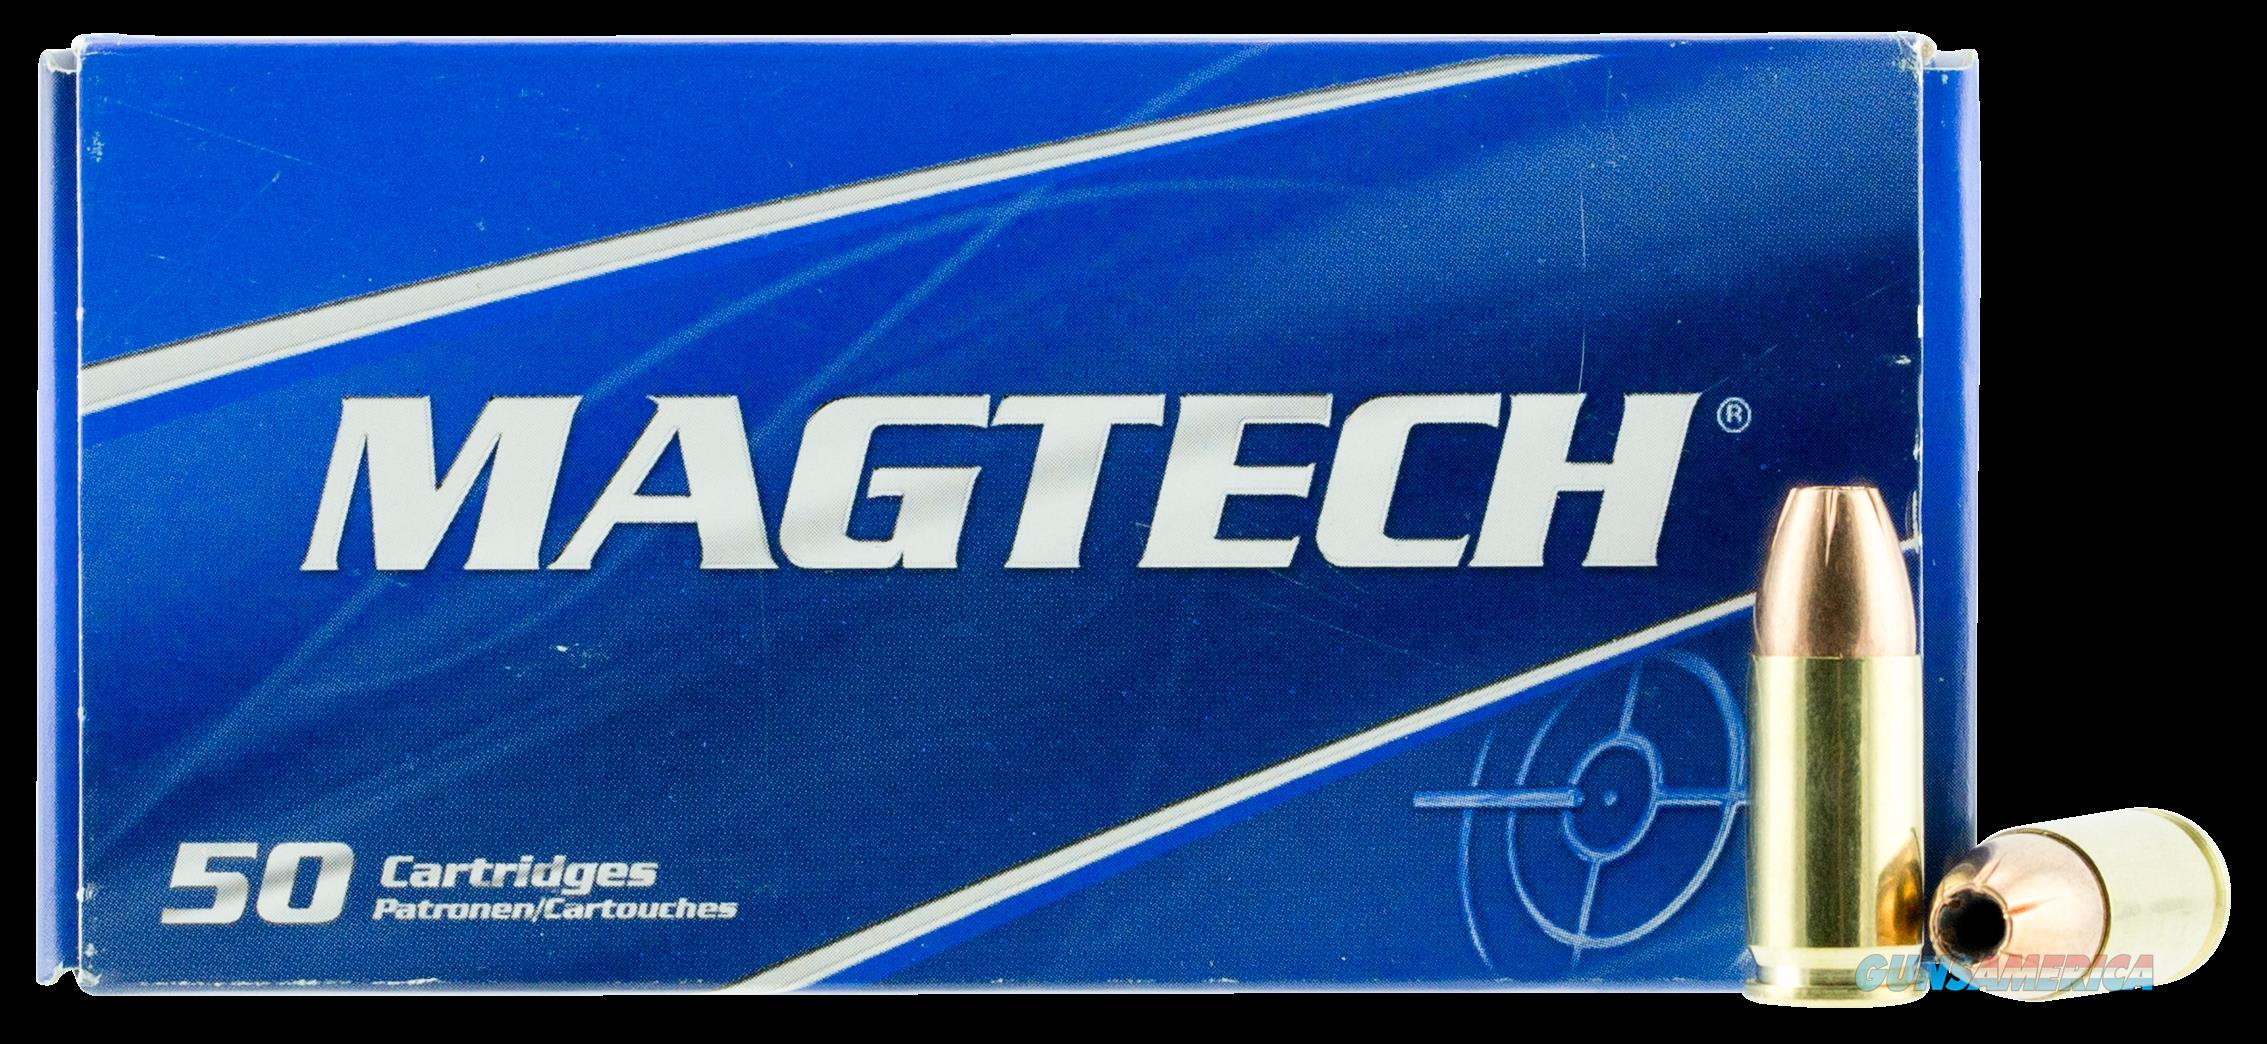 Magtech Range-training, Magtech 32b    32 Acp   71 Jhp   50-20  Guns > Pistols > 1911 Pistol Copies (non-Colt)